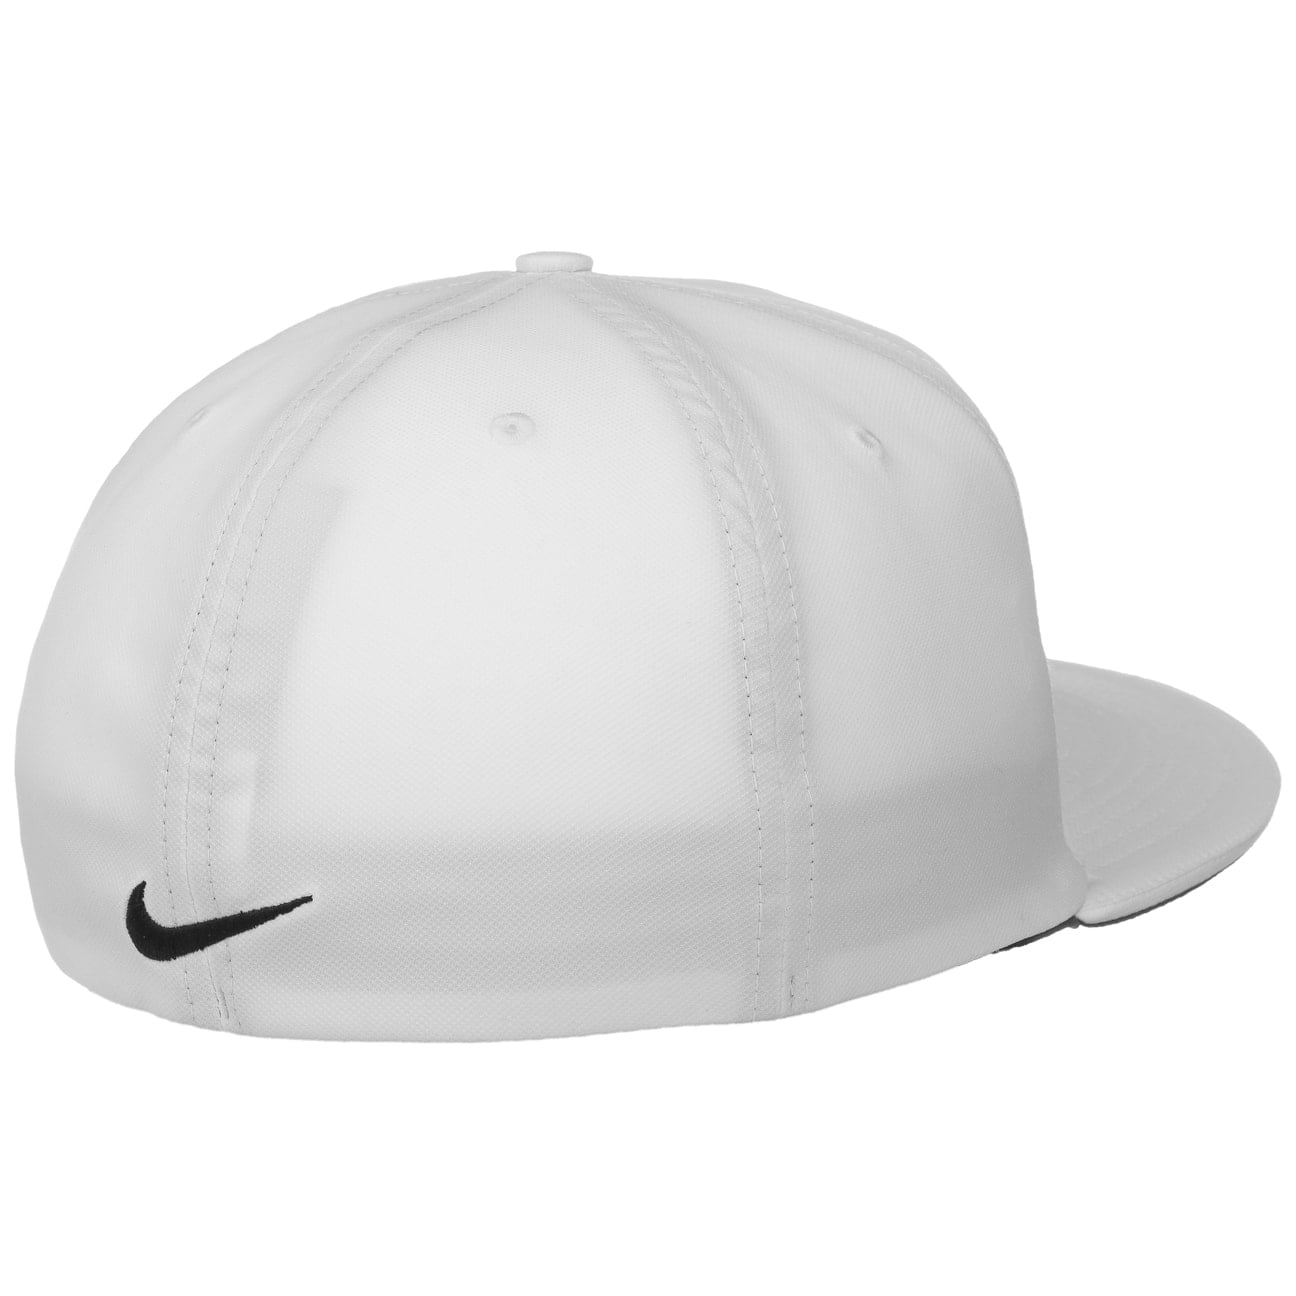 True Statement Clima Uni Cap by Nike - Gorras - sombreroshop.es 51935164025